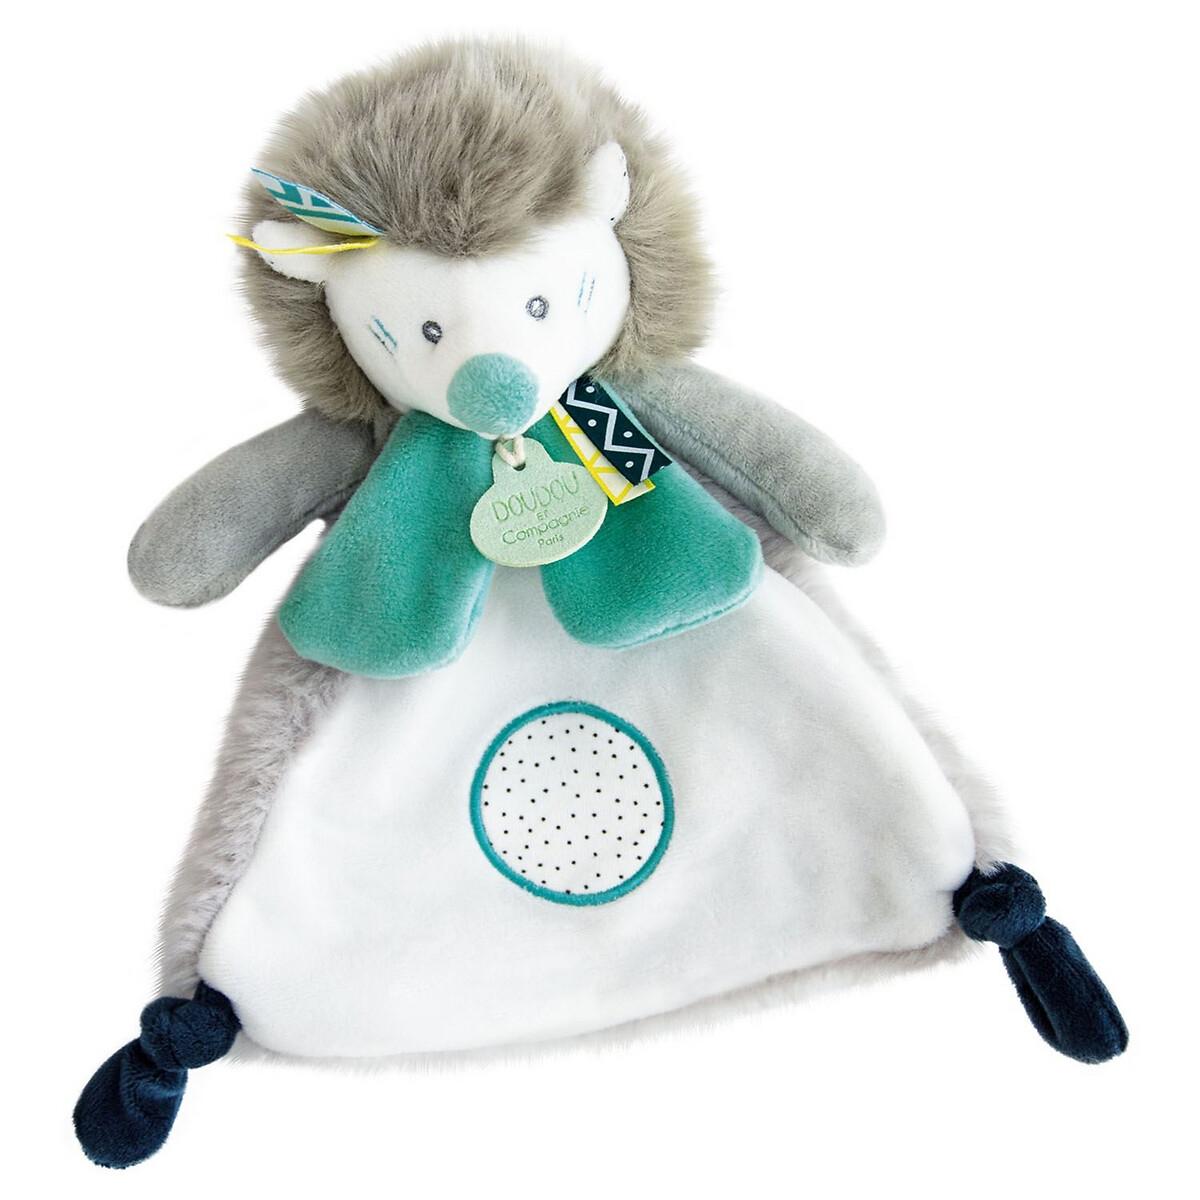 An image of Doudou Et Compagnie Newborn Tiwipi Hedgehog Comforter - 23cm